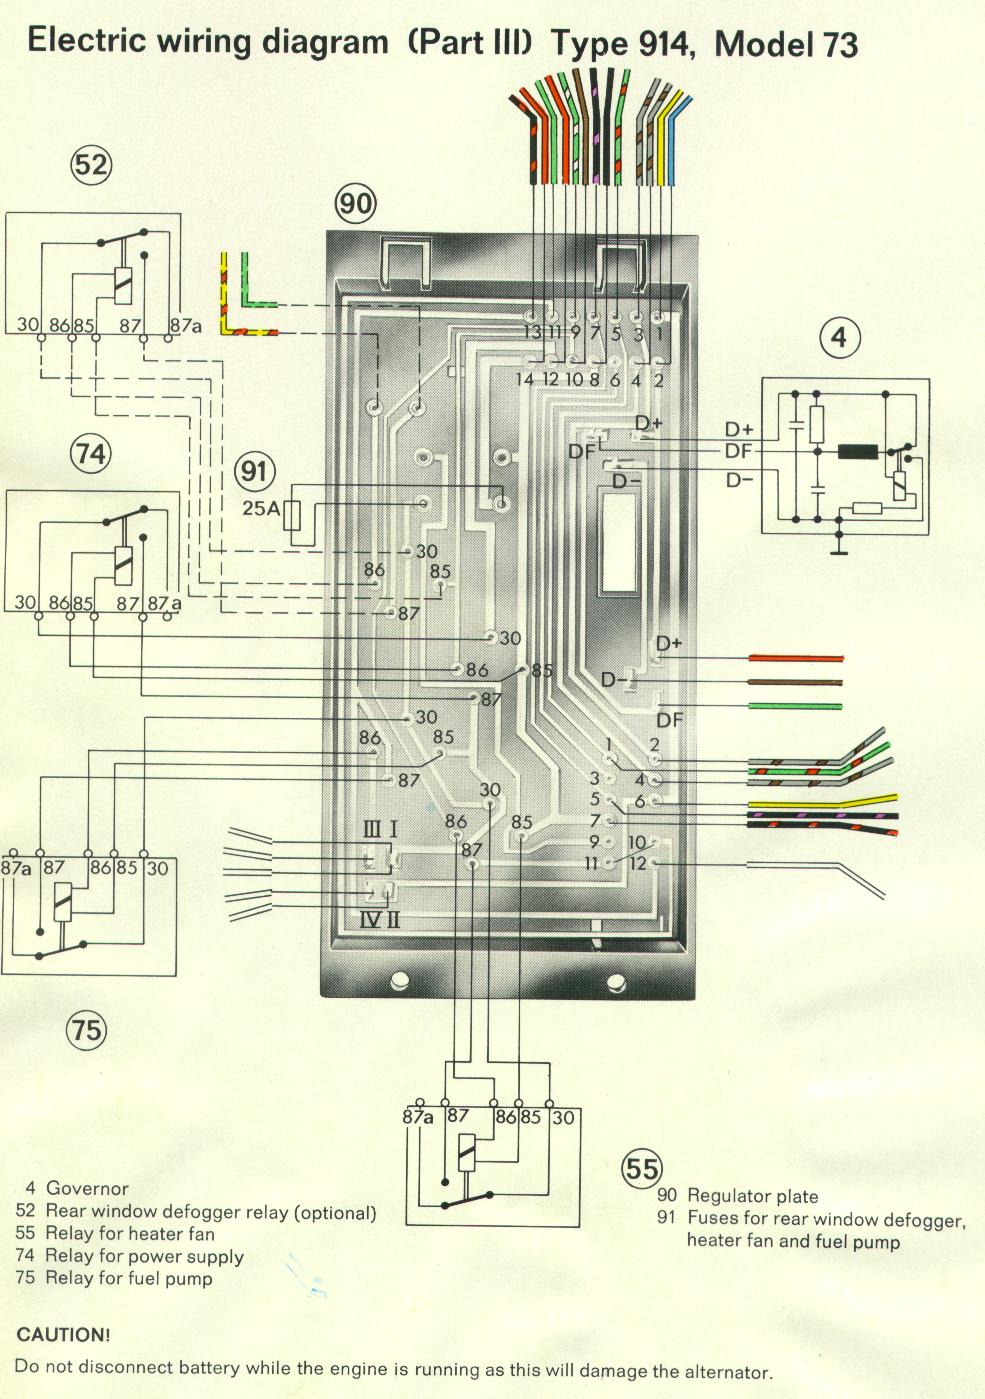 medium resolution of wrg 7489 coil on plug wiring diagram porschecoil on plug wiring diagram porsche